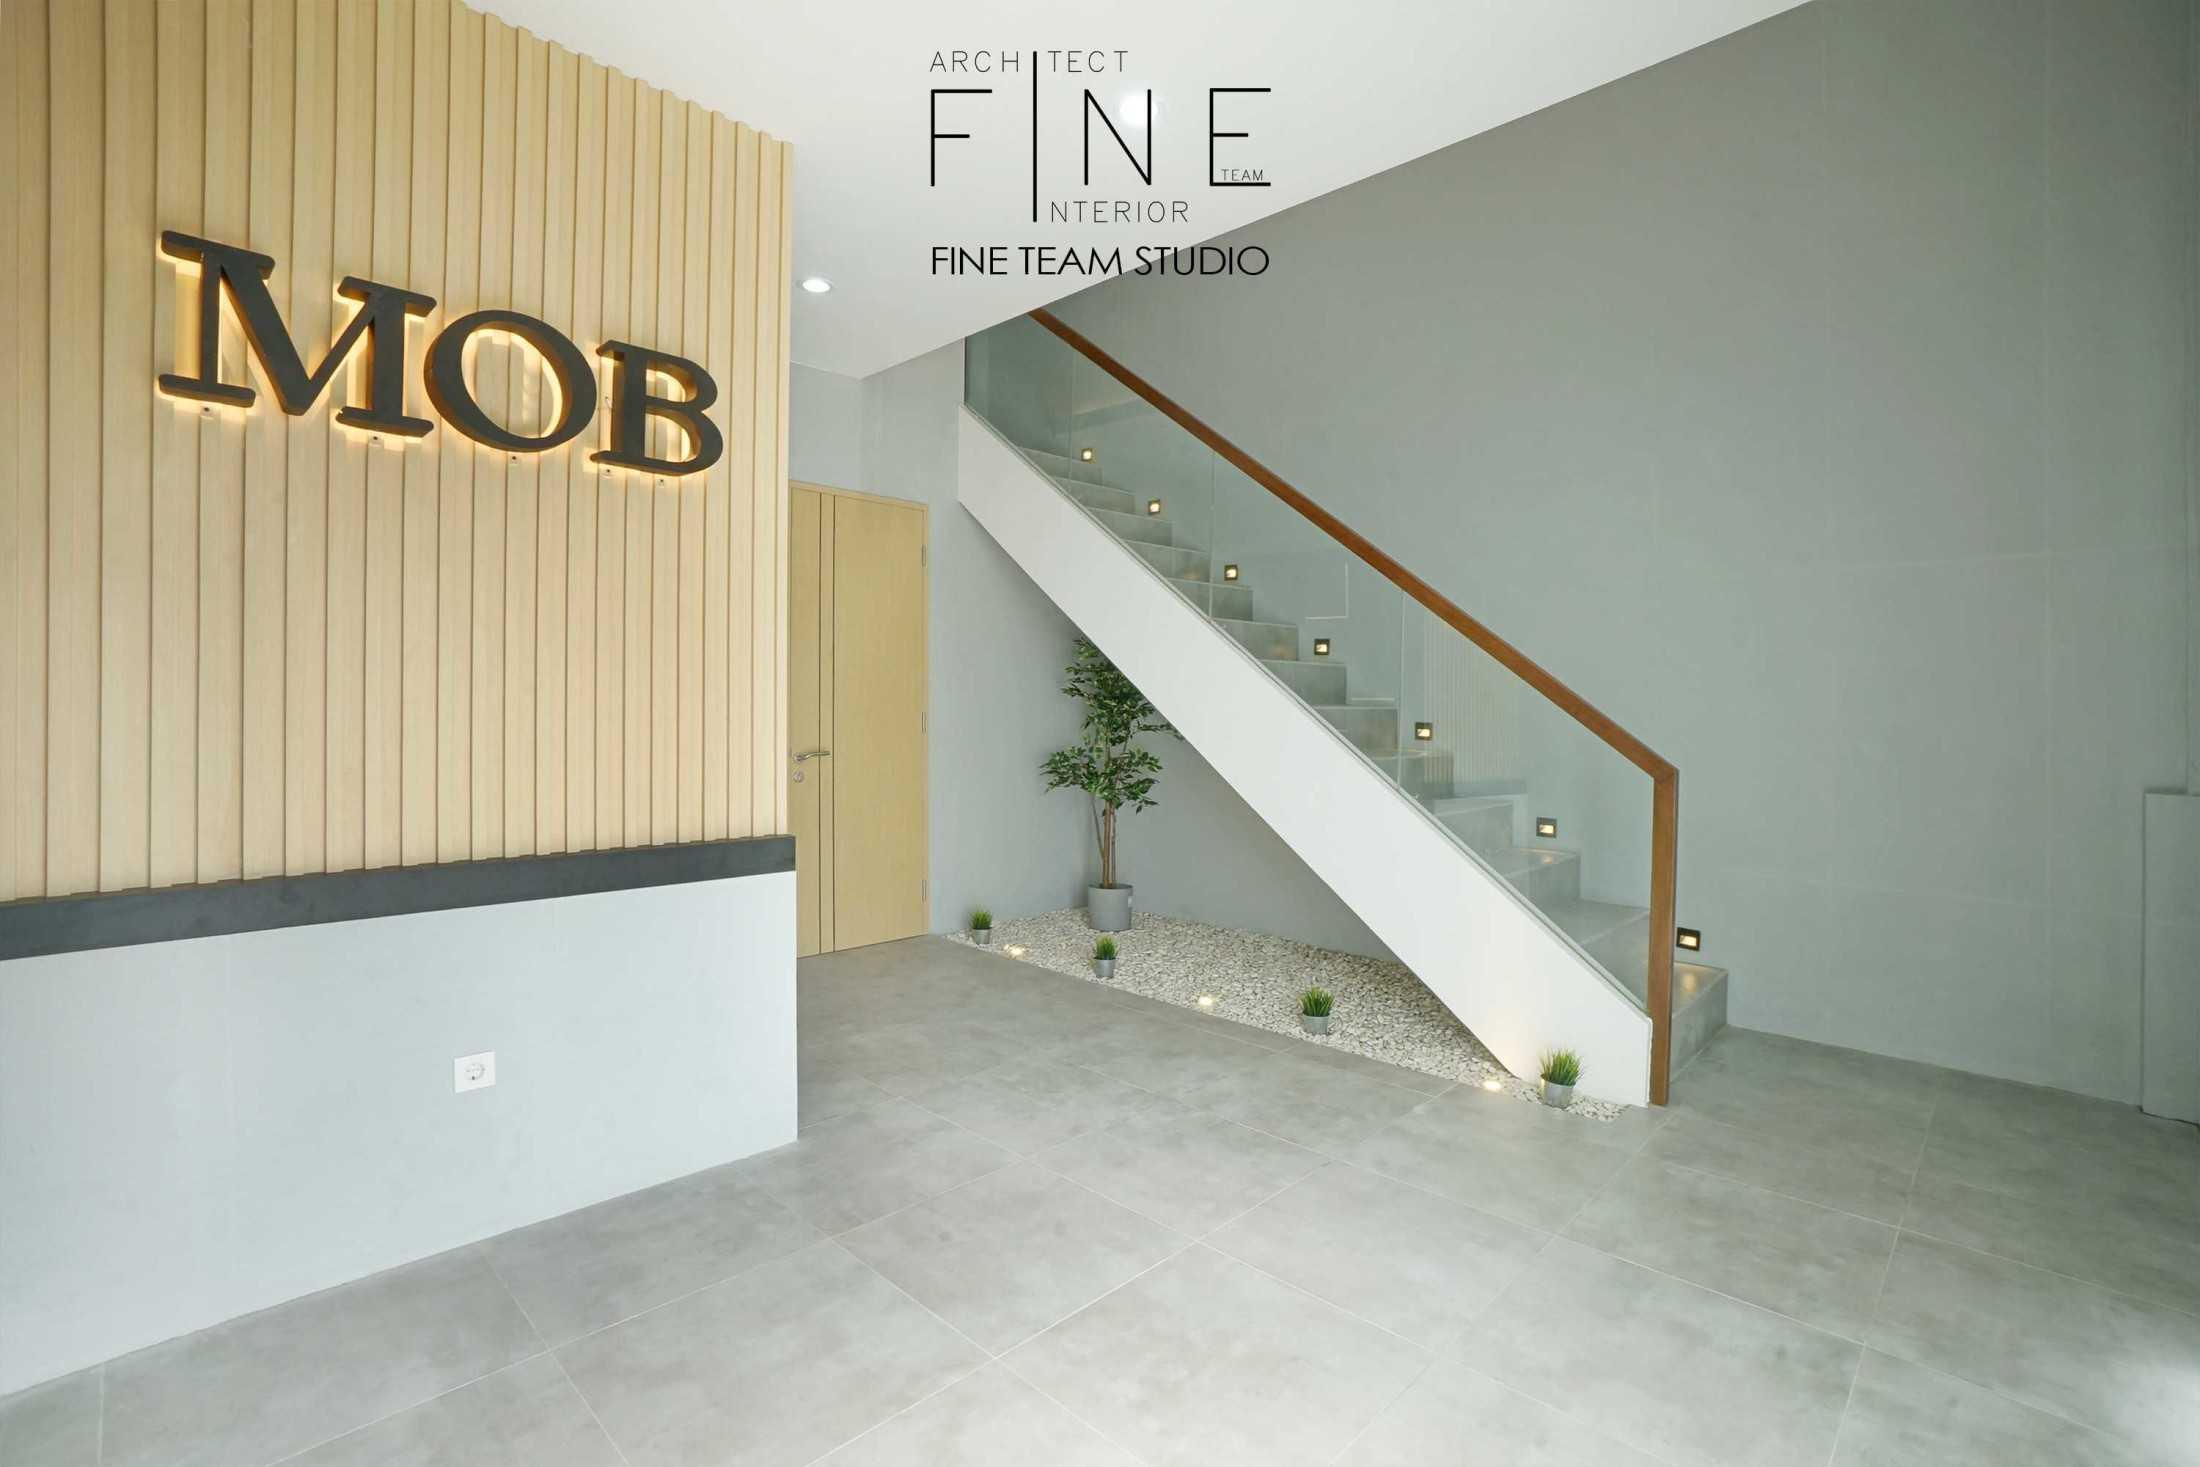 Fine Team Studio Mob Office Cikupa, Tangerang, Banten, Indonesia Cikupa, Tangerang, Banten, Indonesia Fine-Team-Studio-Mob-Office  71164